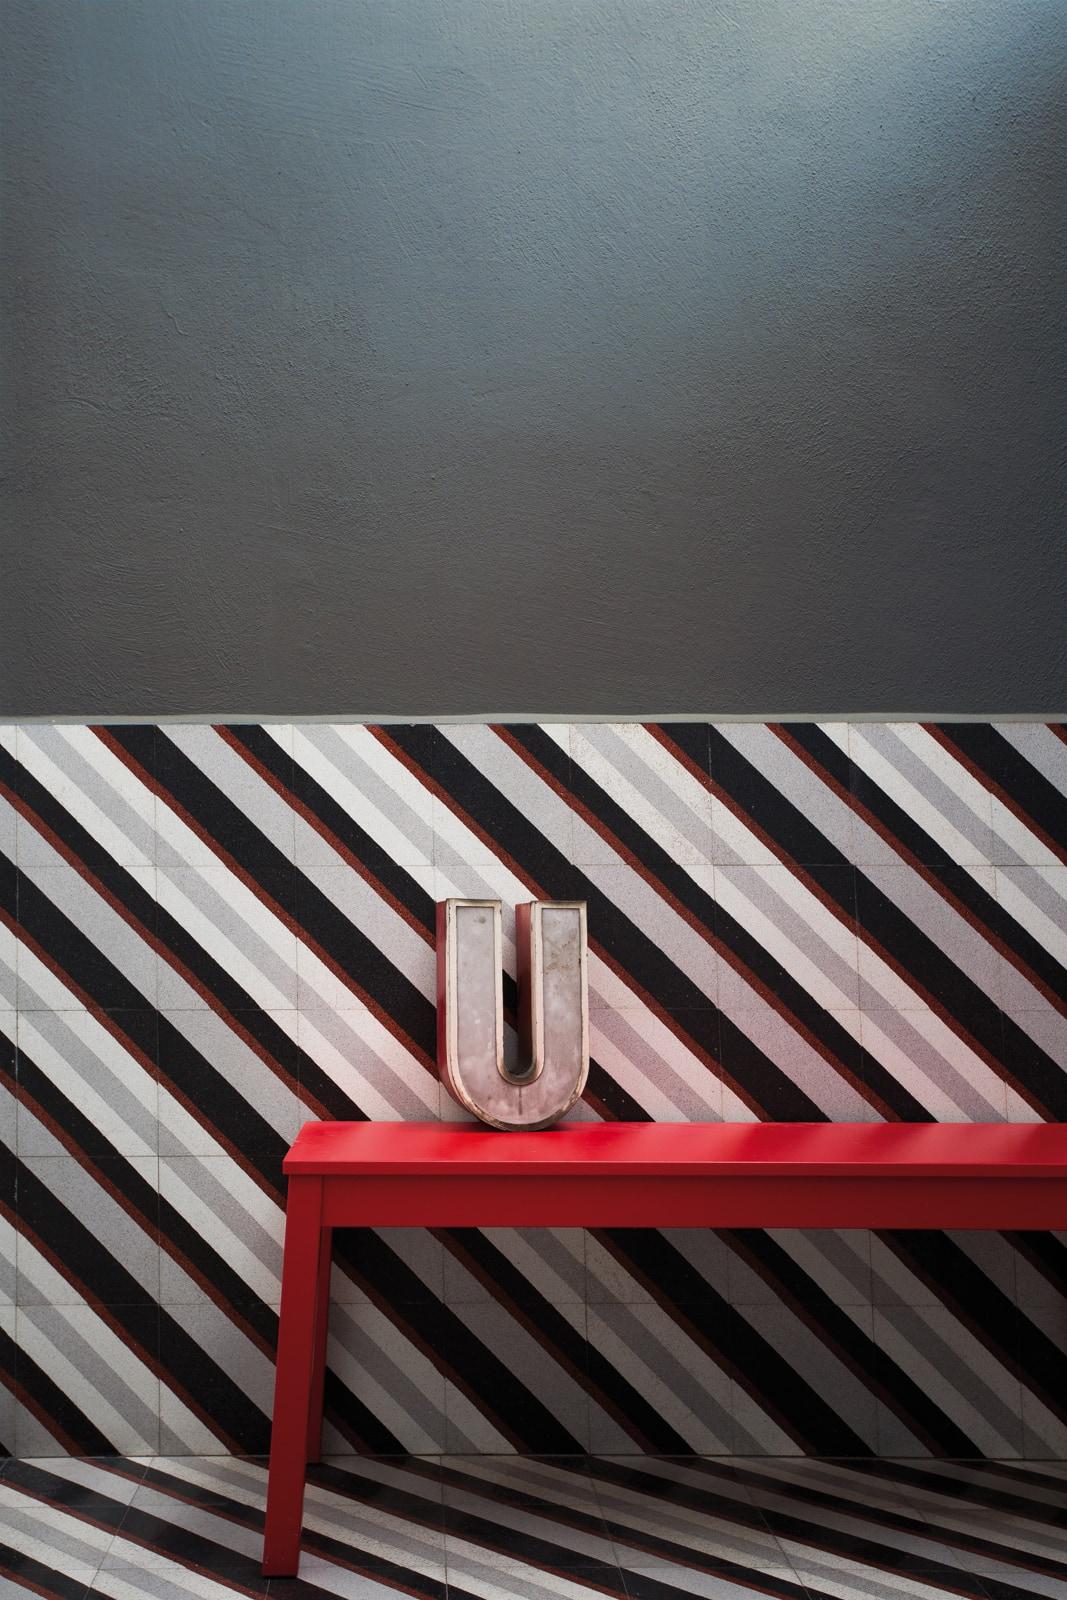 VIA-Kreidefarbe-603-Schiefer | Kreidefarbe Schiefer 60 ml